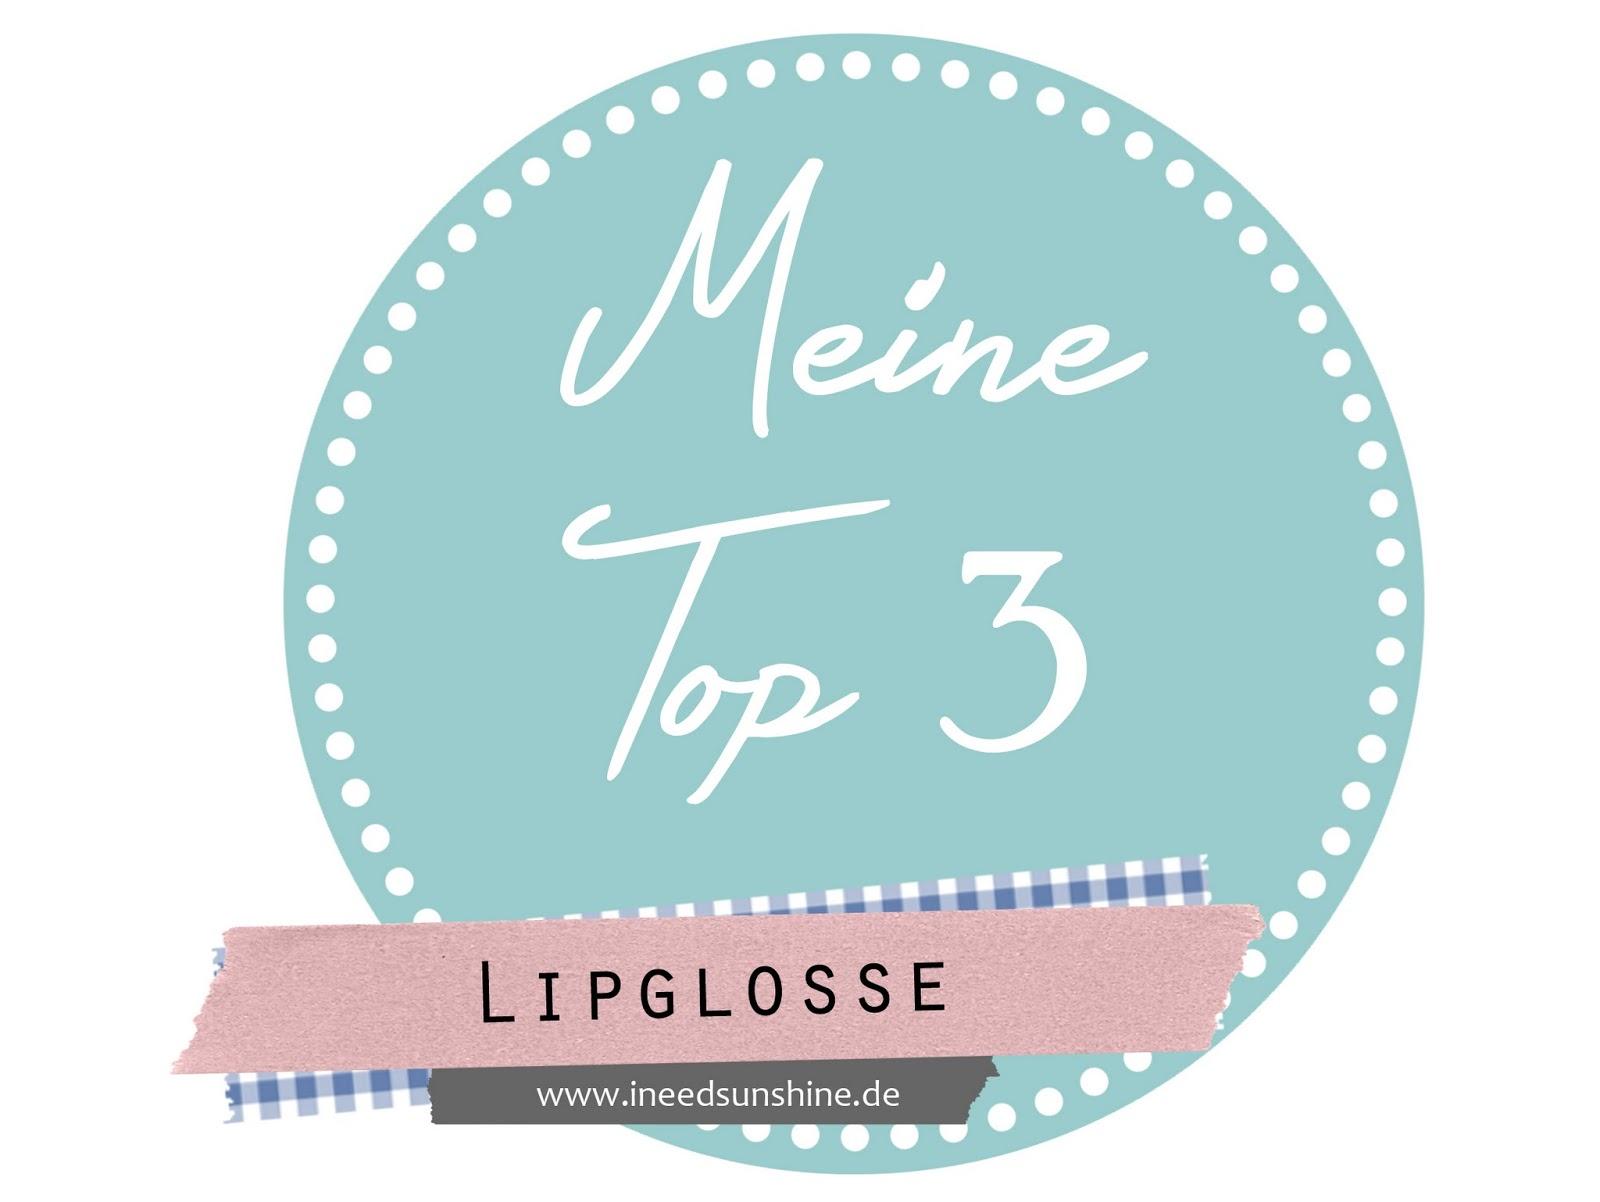 http://www.ineedsunshine.de/2014/06/platz-der-sonne-28-meine-top-3-lipglosse.html